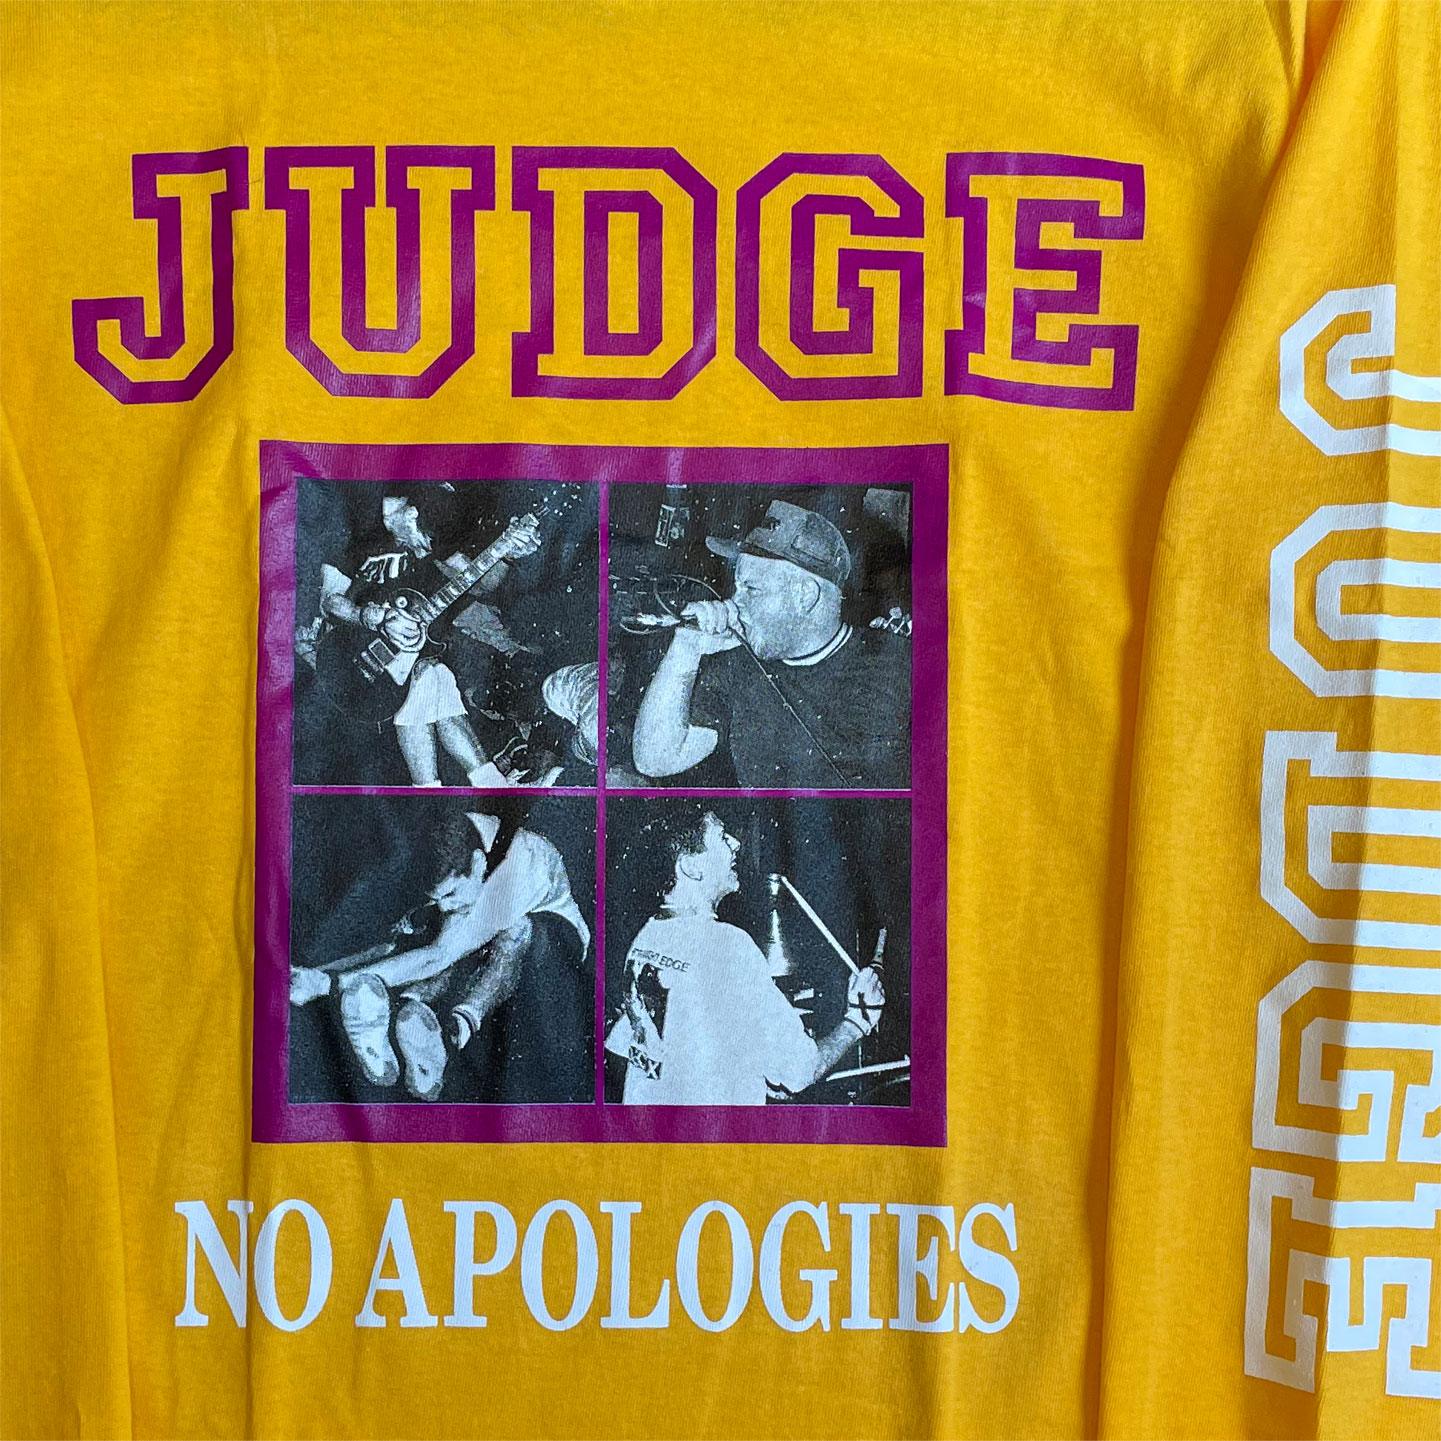 JUDGE ロングスリーブTシャツ NO APOLOGIES